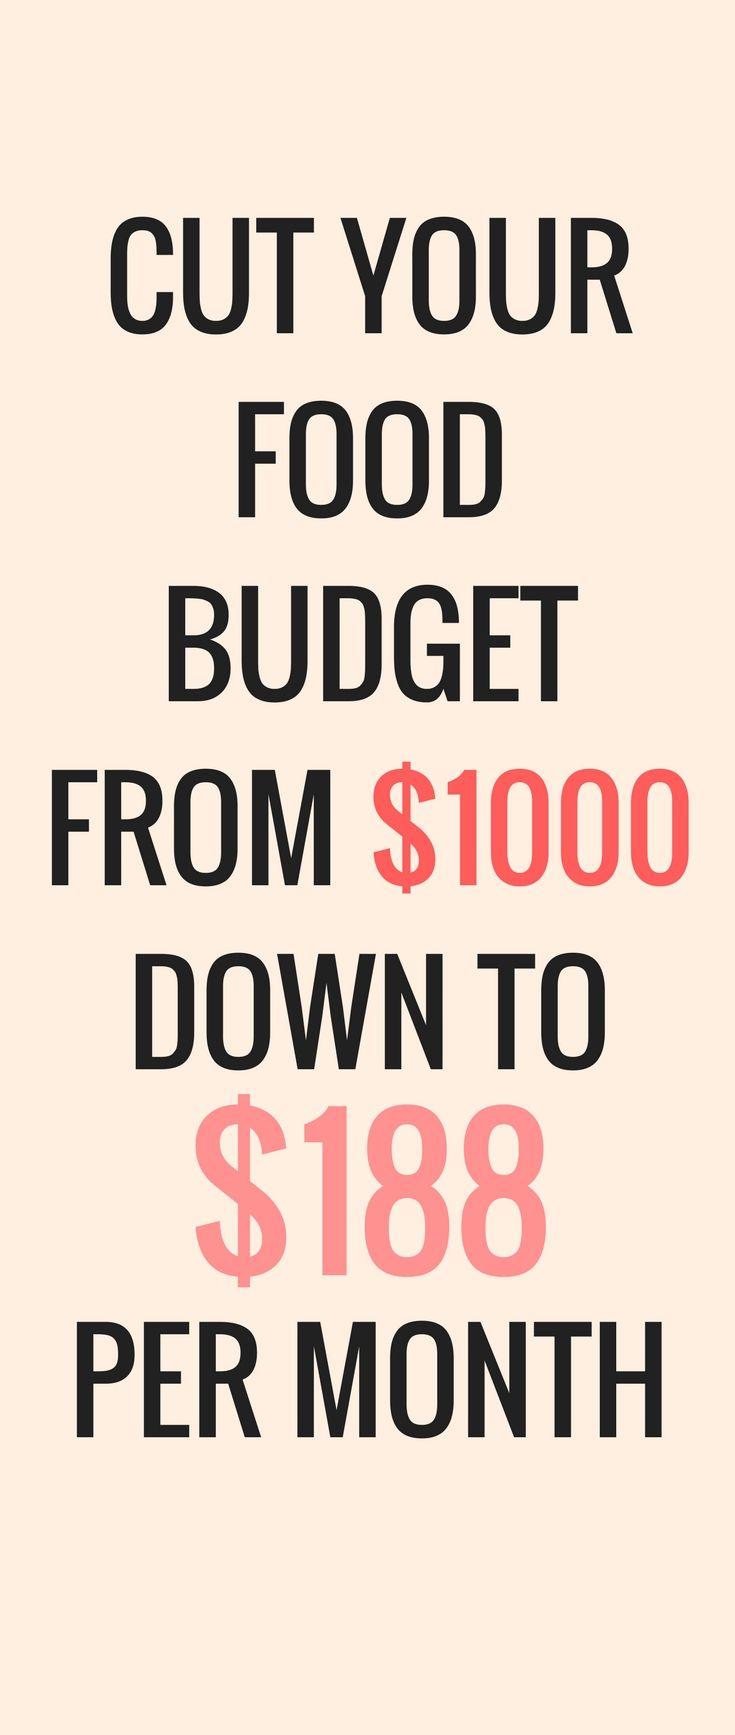 best frugals images on pinterest frugal tips frugal and money